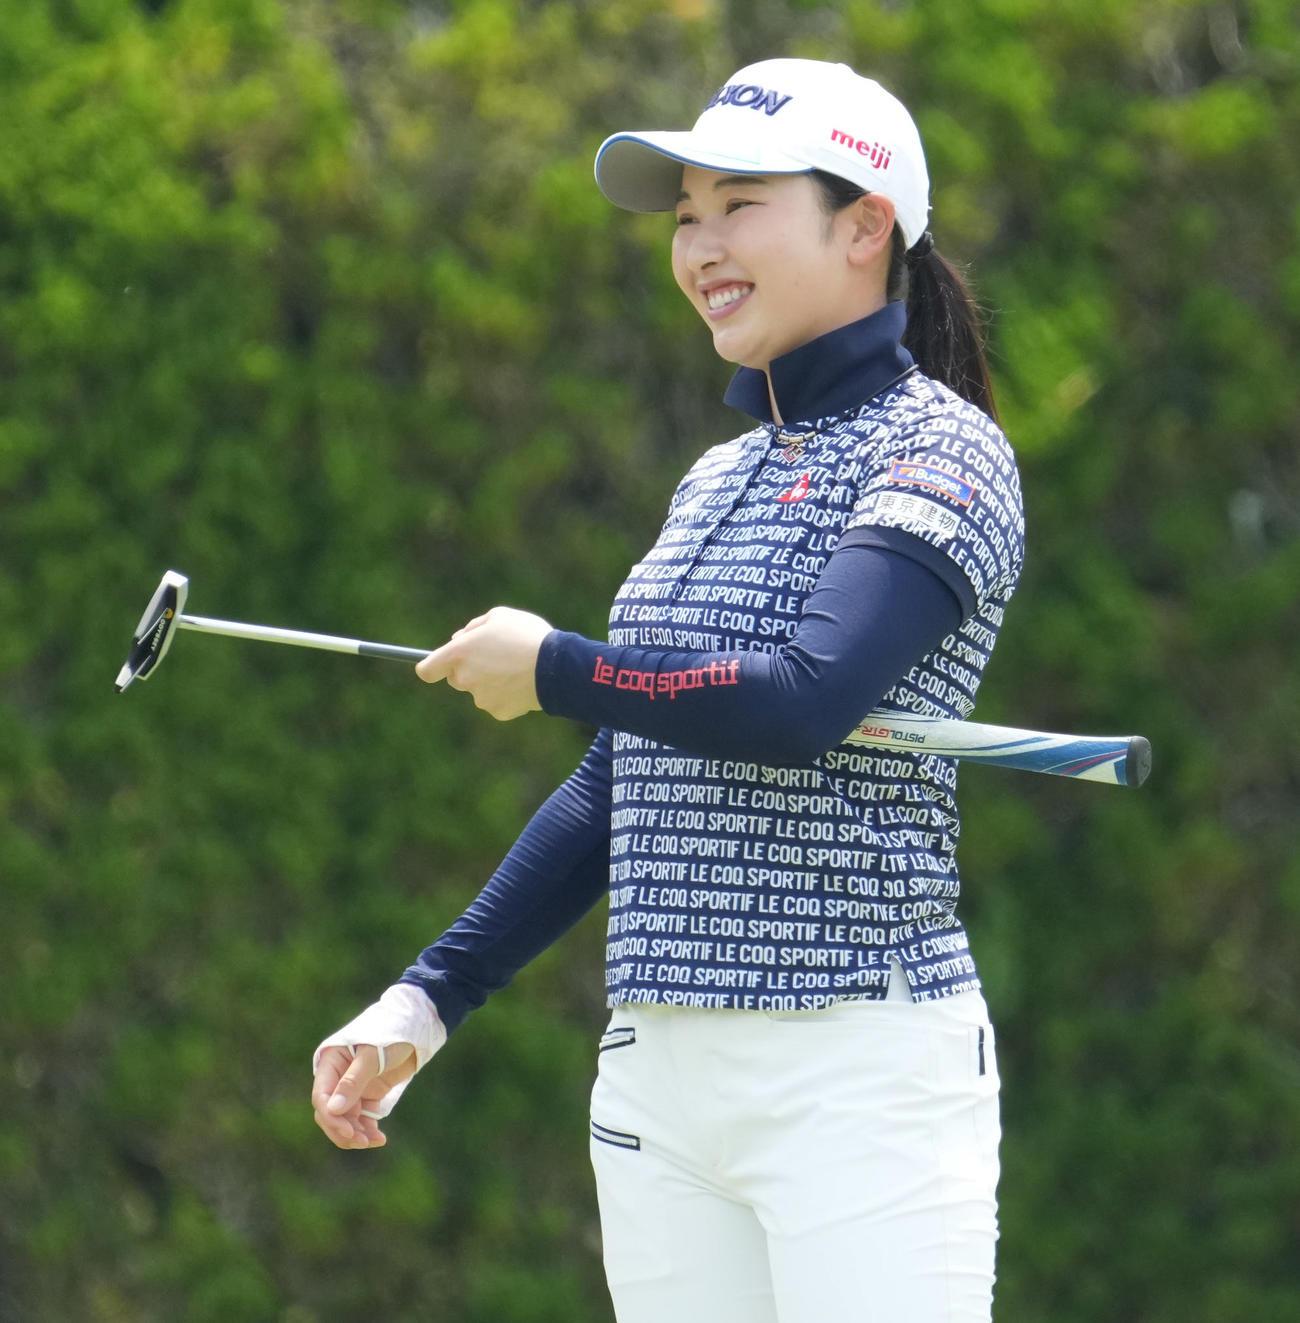 https://www.nikkansports.com/sports/golf/news/img/202106080000364-w1300_2.jpg